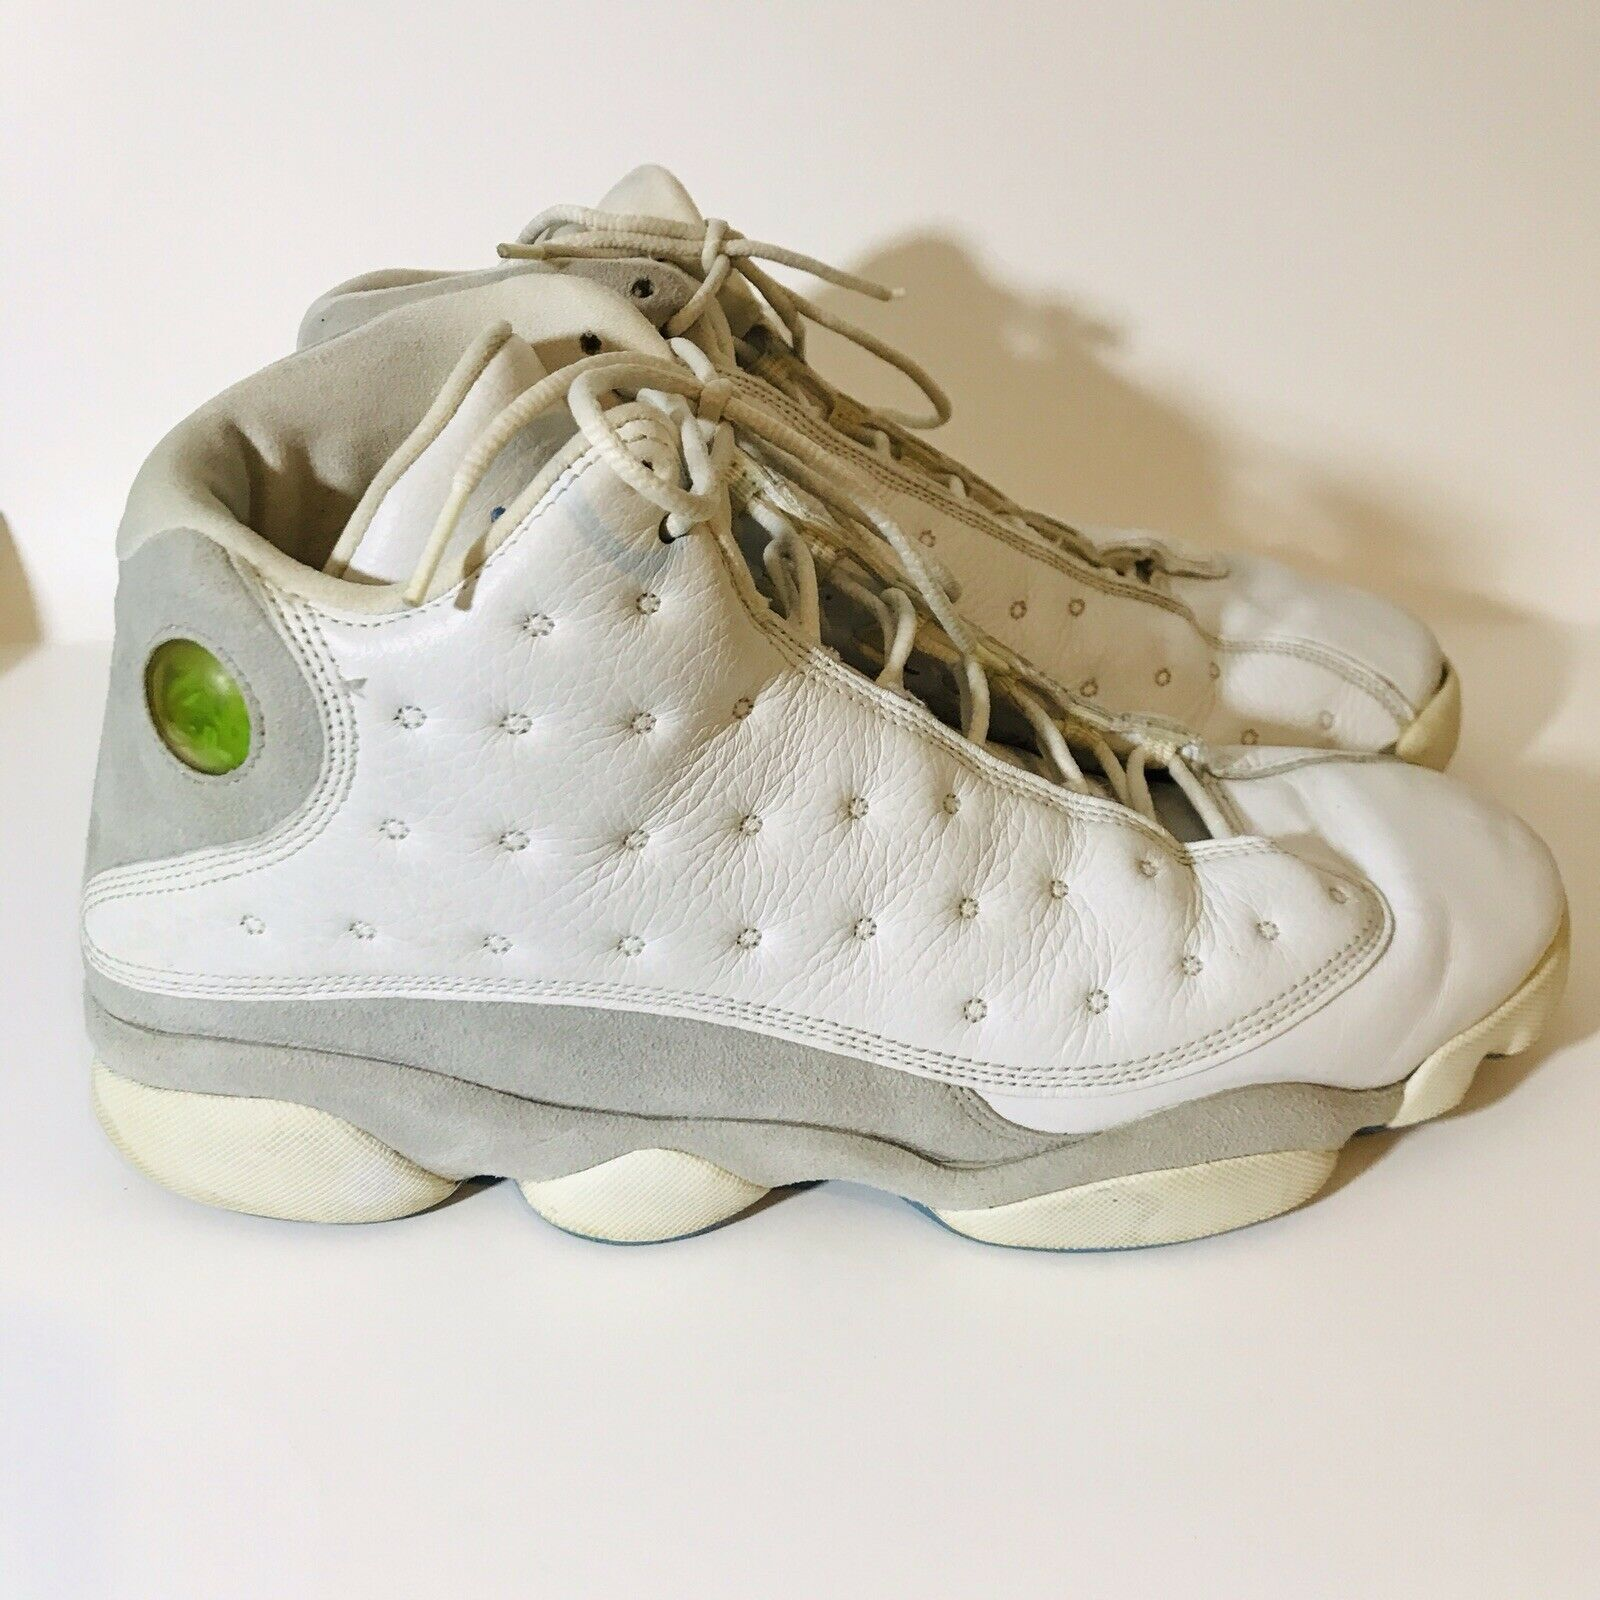 Nike Air Jordan 13 Retro Sz 12 White Flint Grey University bluee 310004-103 2004